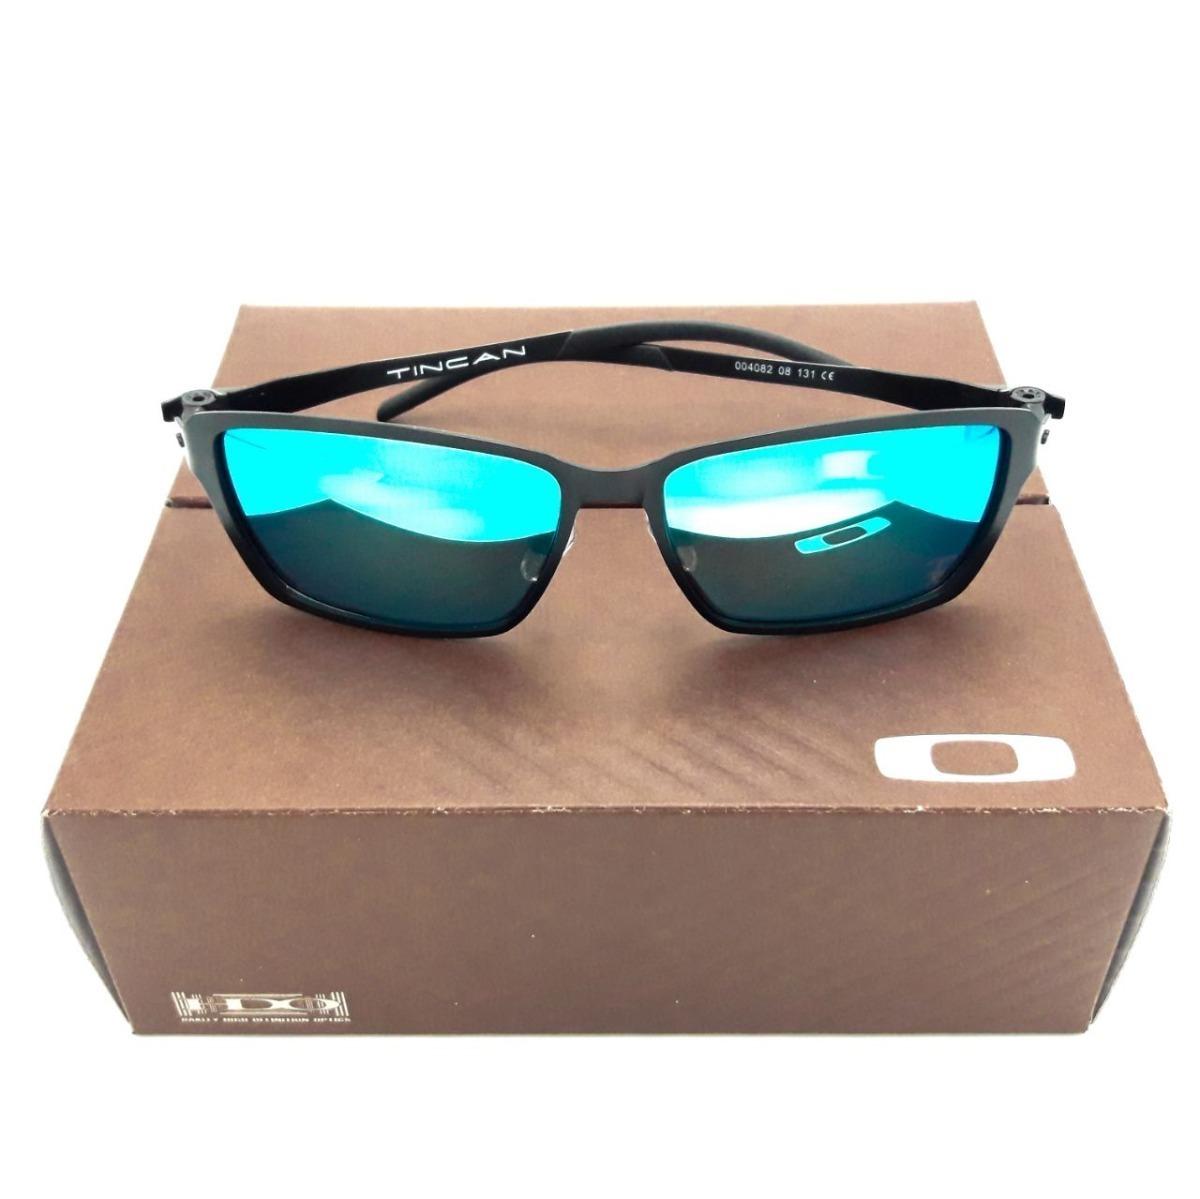 4c0eeafe9 oculos oakley tican ferrari x metal lente ice thug promoção. Carregando  zoom.